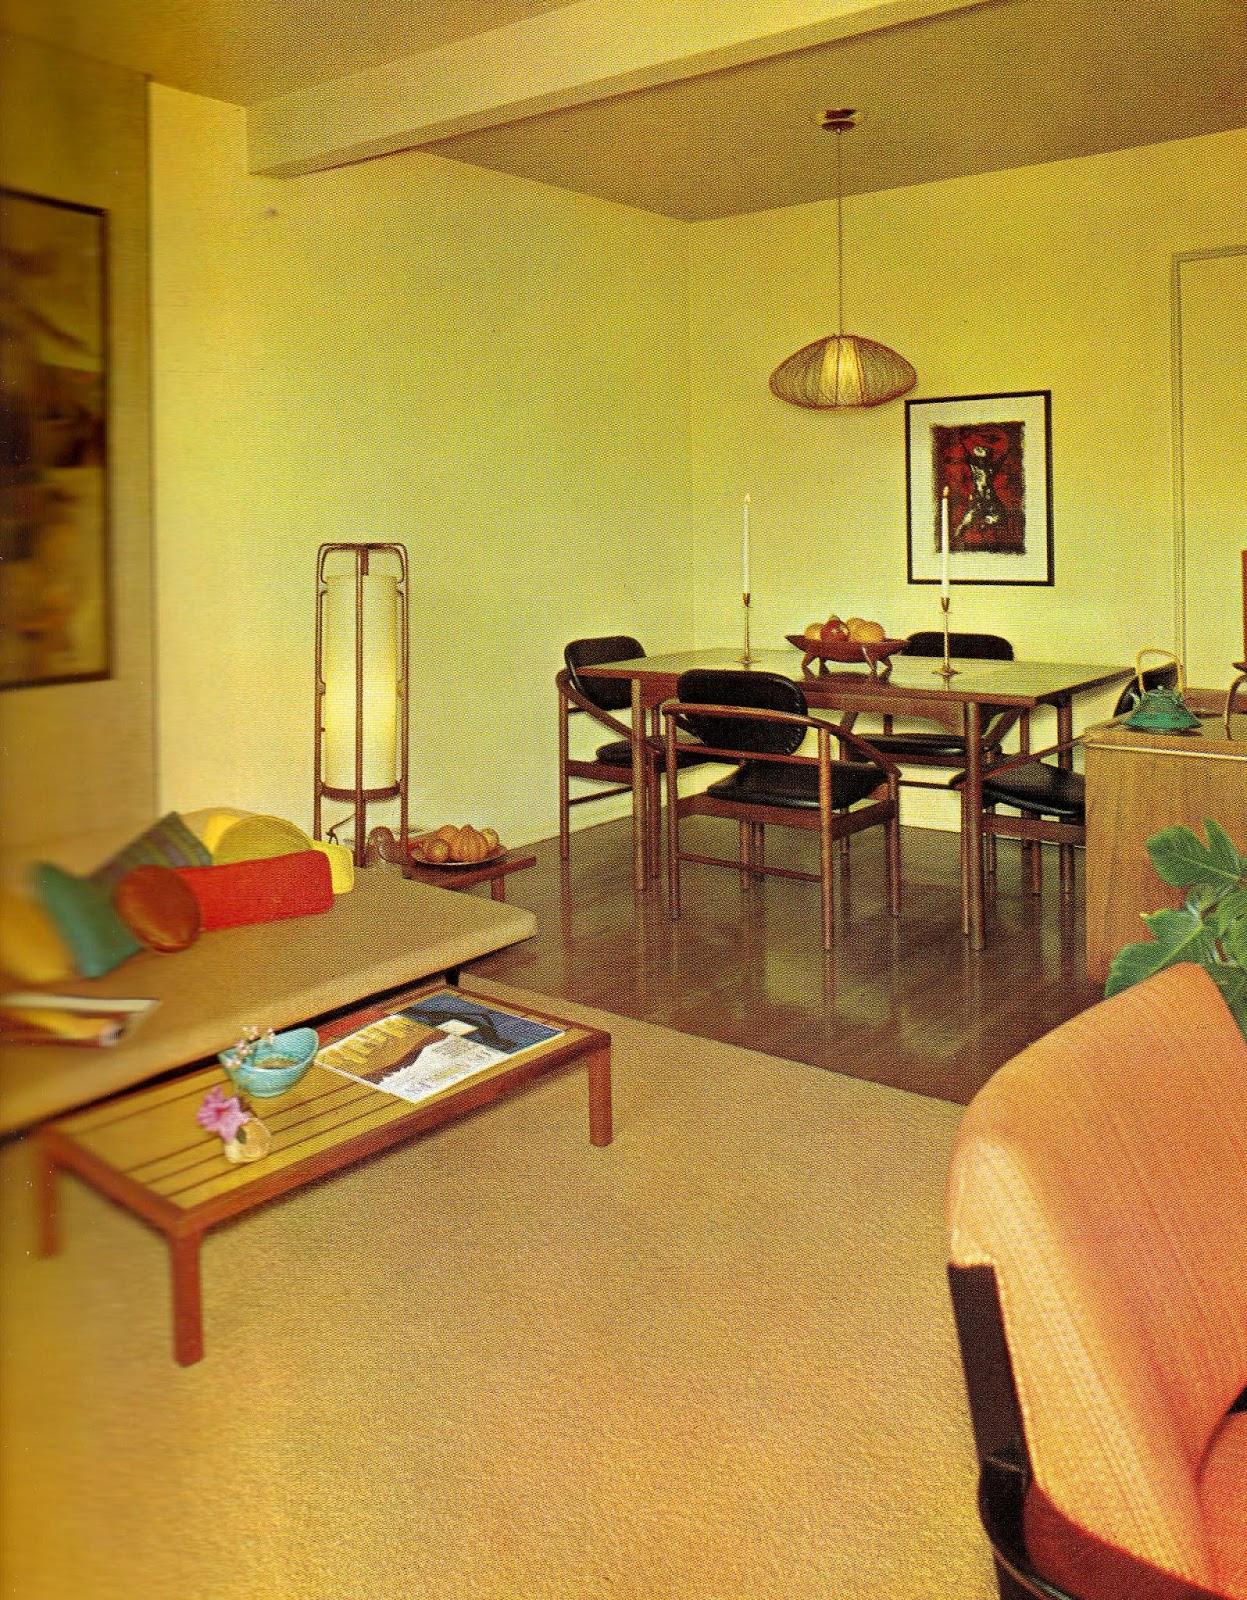 interior 1960s decor interiors decoration sixties were everyday psychedelia apex 1965